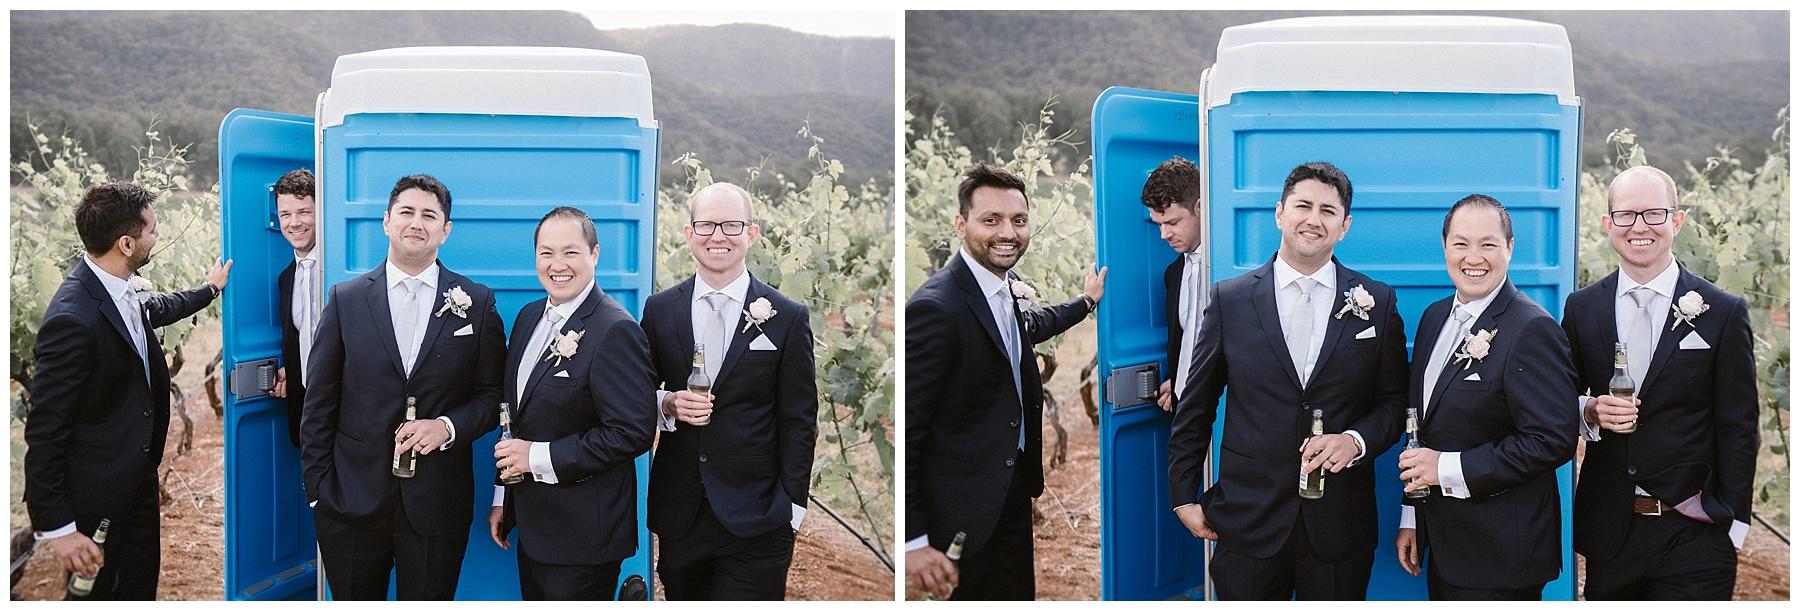 AUDREY WILKING COCKFIGHTERS GHOST Wedding Photographer_0048.jpg